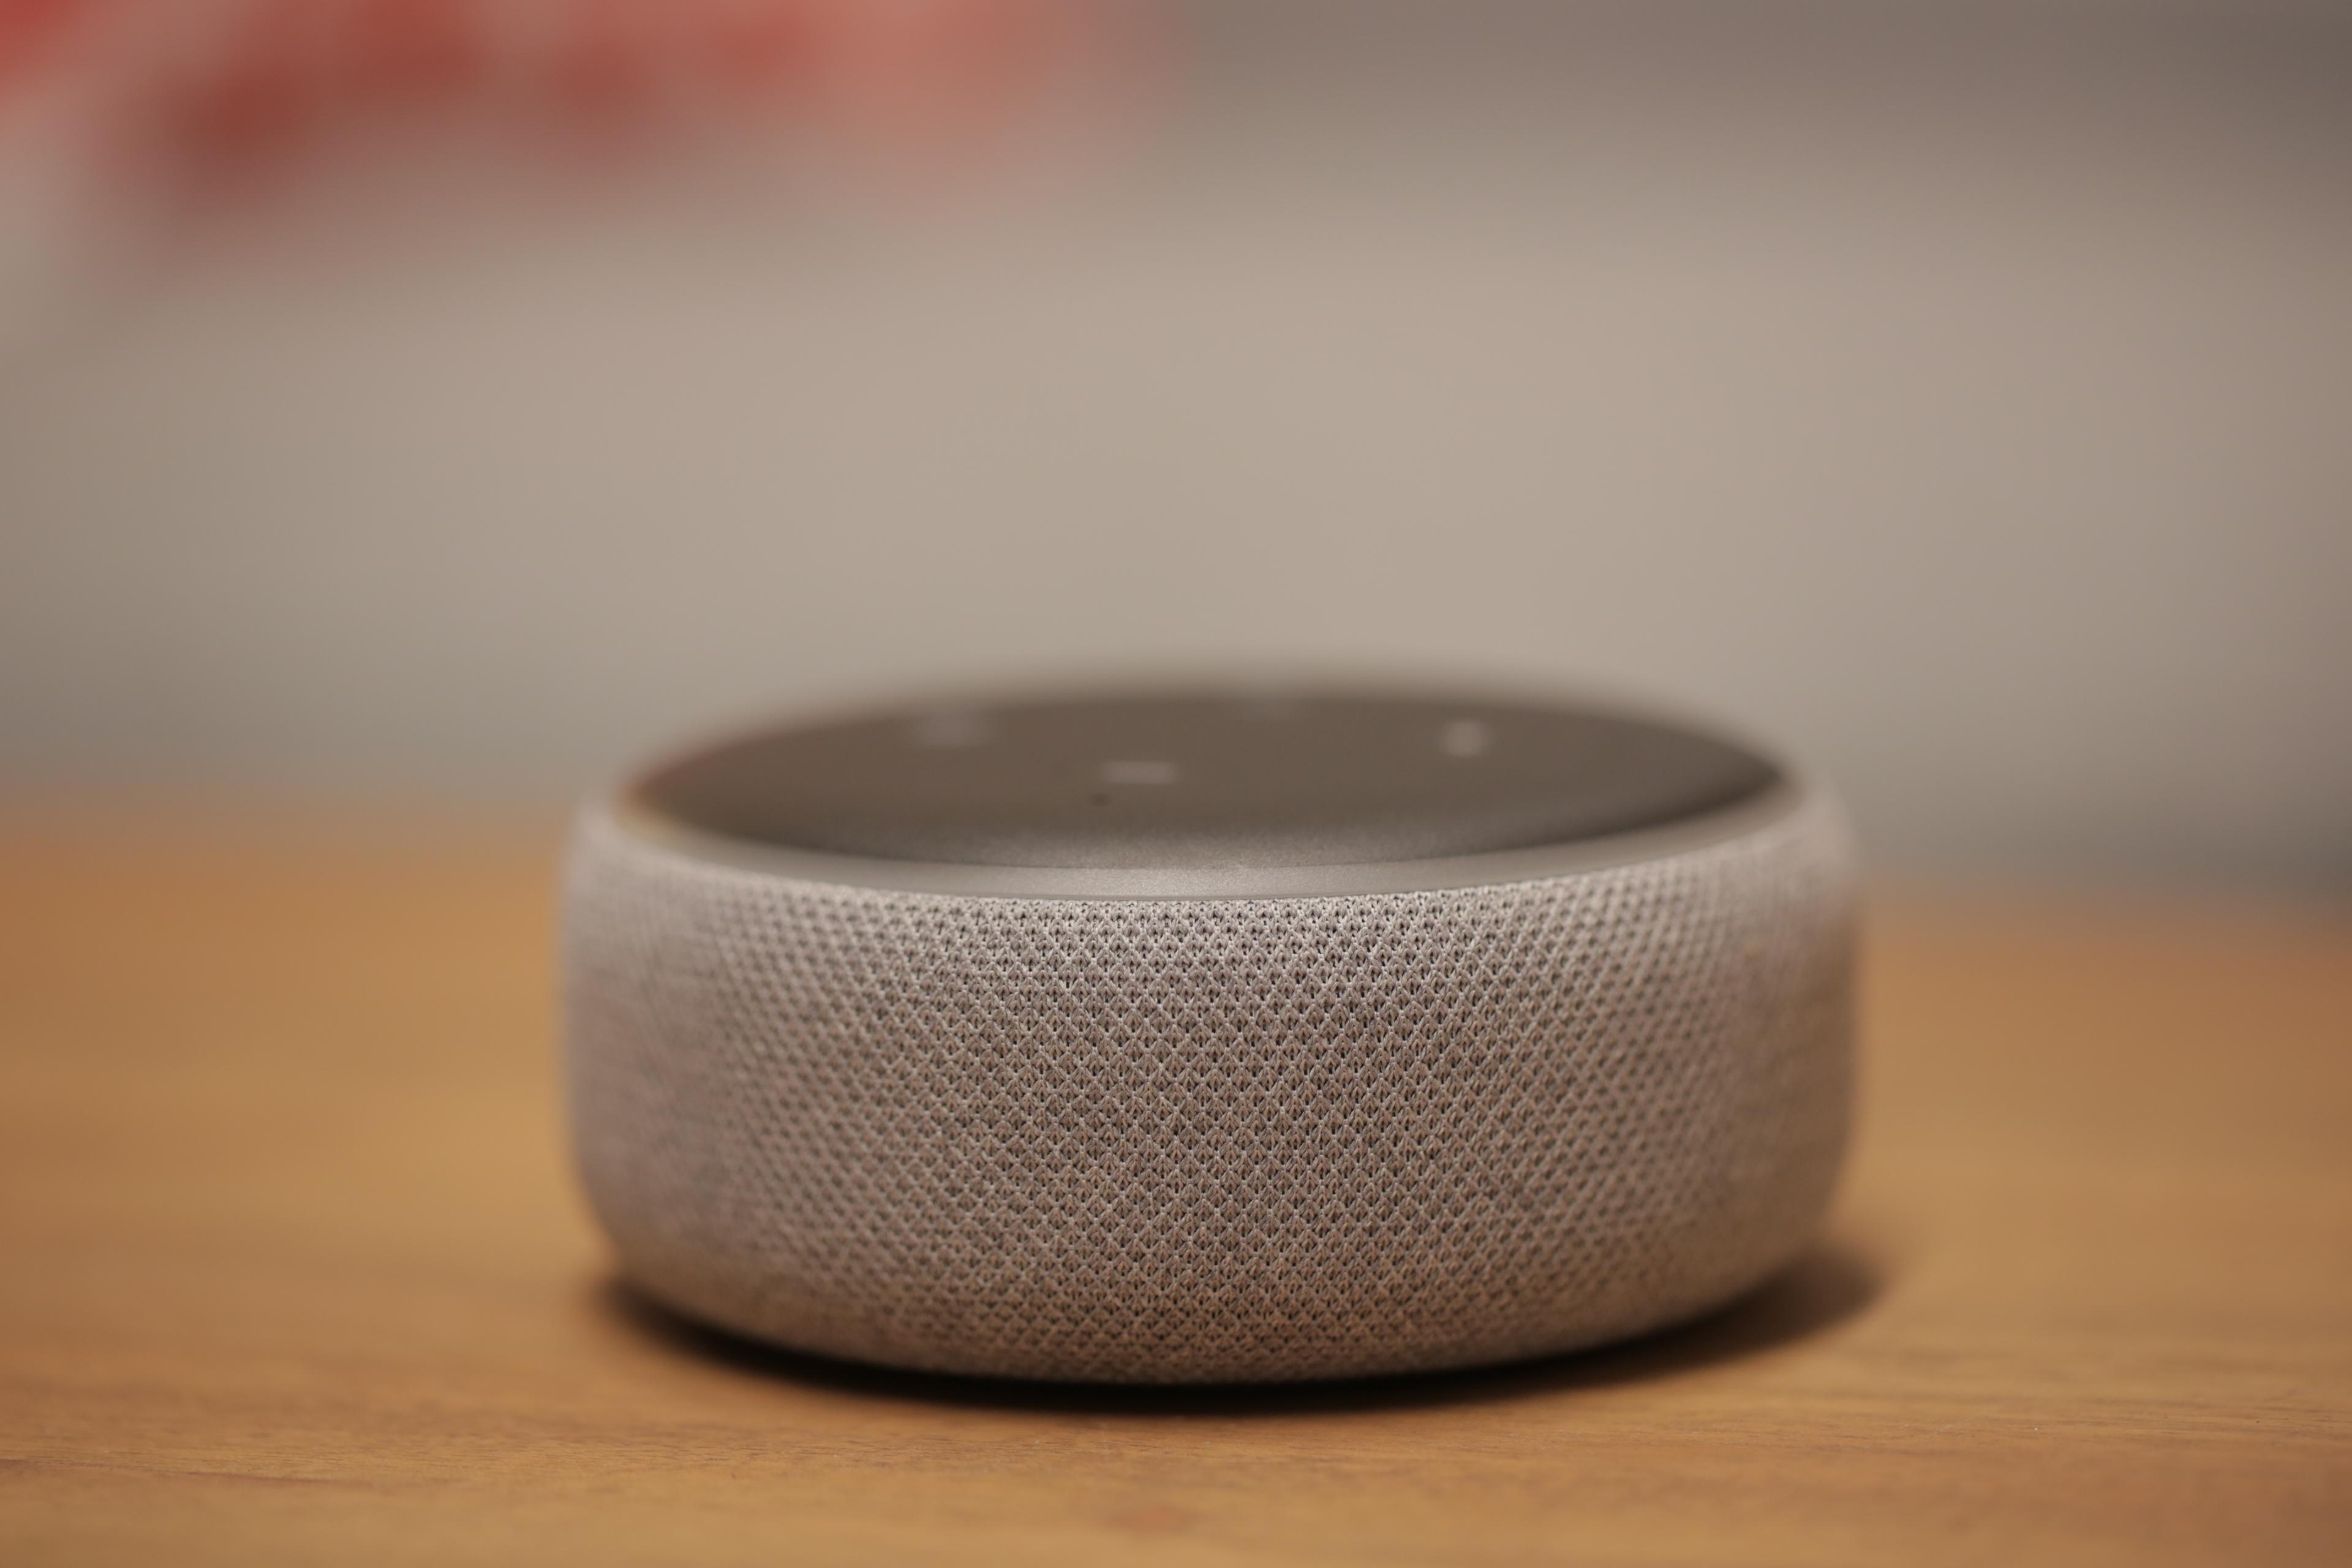 Amazon Echo Dot 3 review CMB 4658